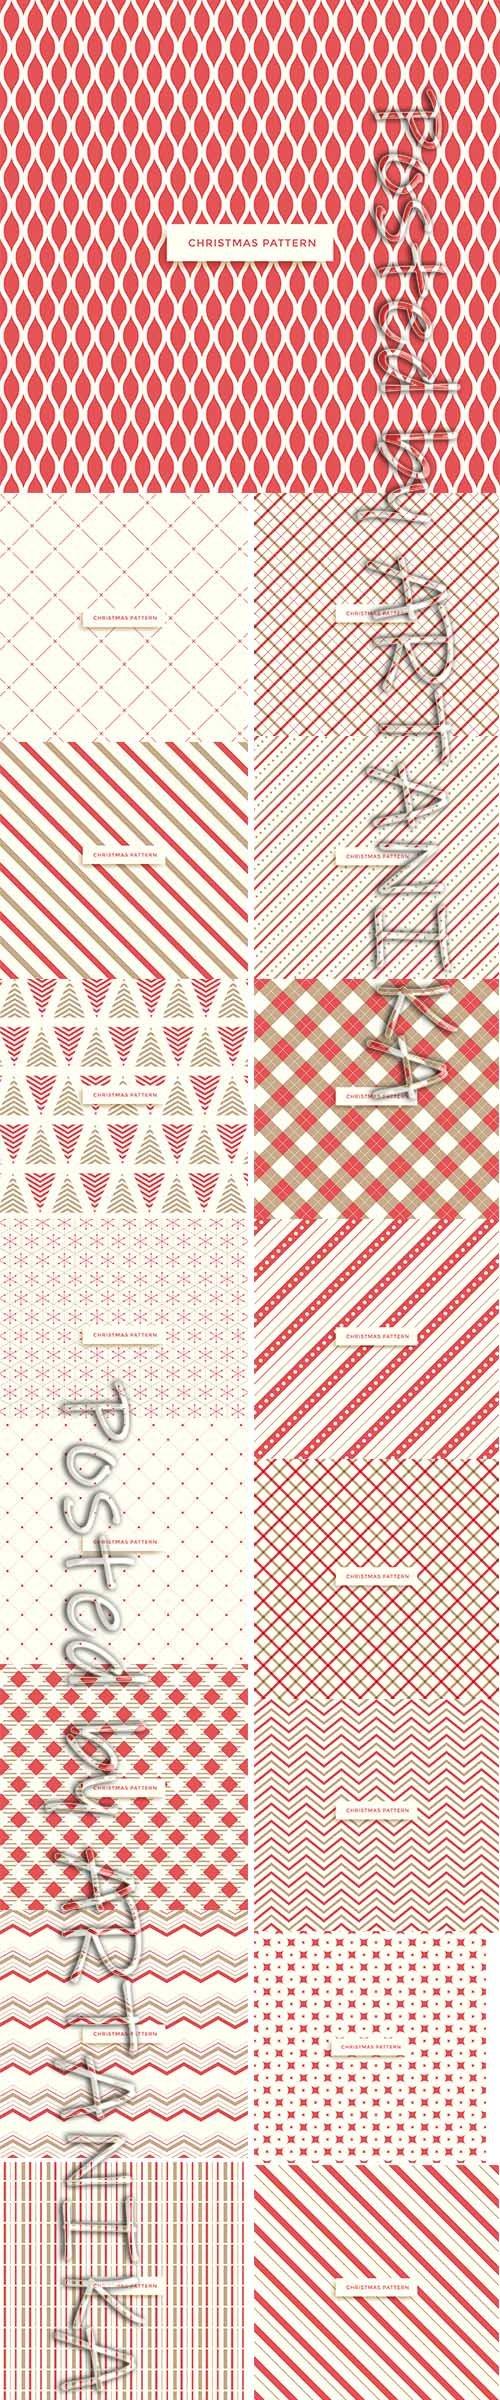 Christmas Pattern Winter Backgrounds